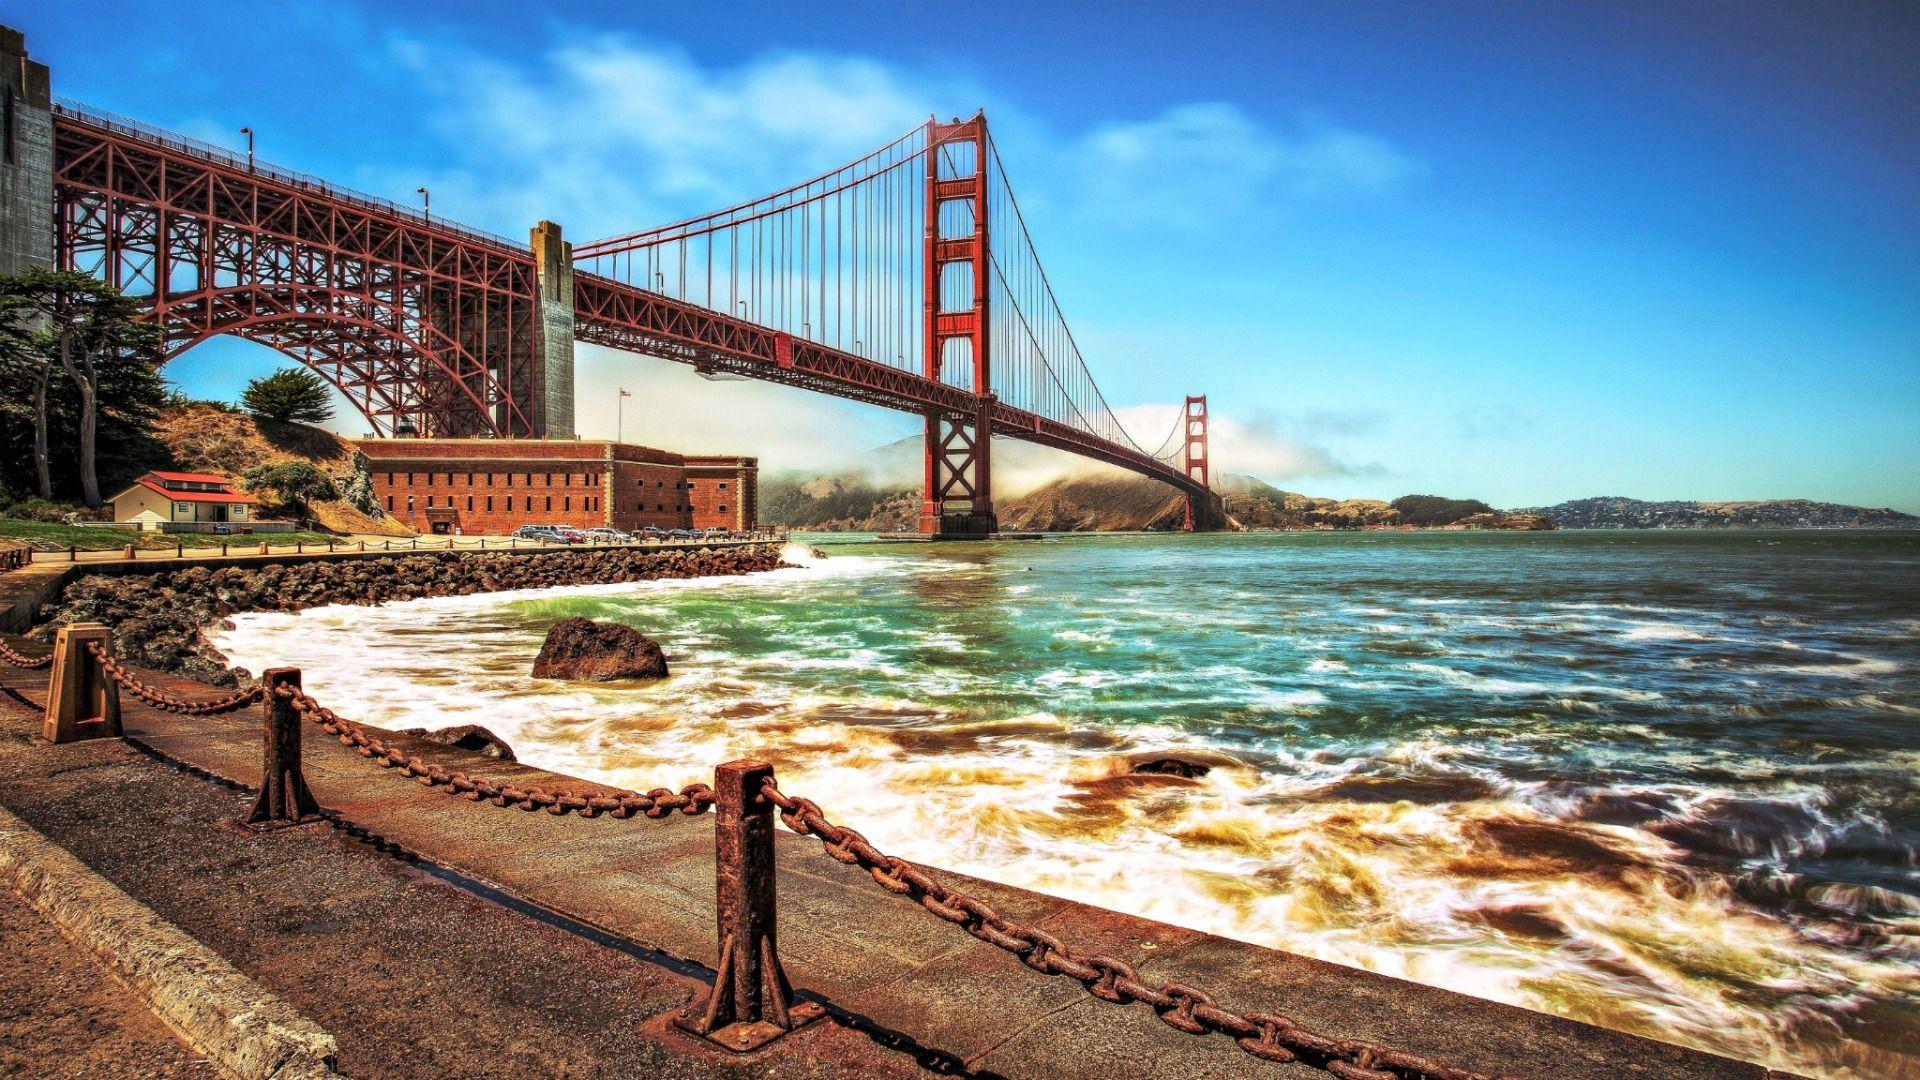 Golden Gate Bridge Wallpapers High Quality Download Free Golden Gate Bridge Wallpaper San Francisco Golden Gate Bridge Golden Gate Bridge